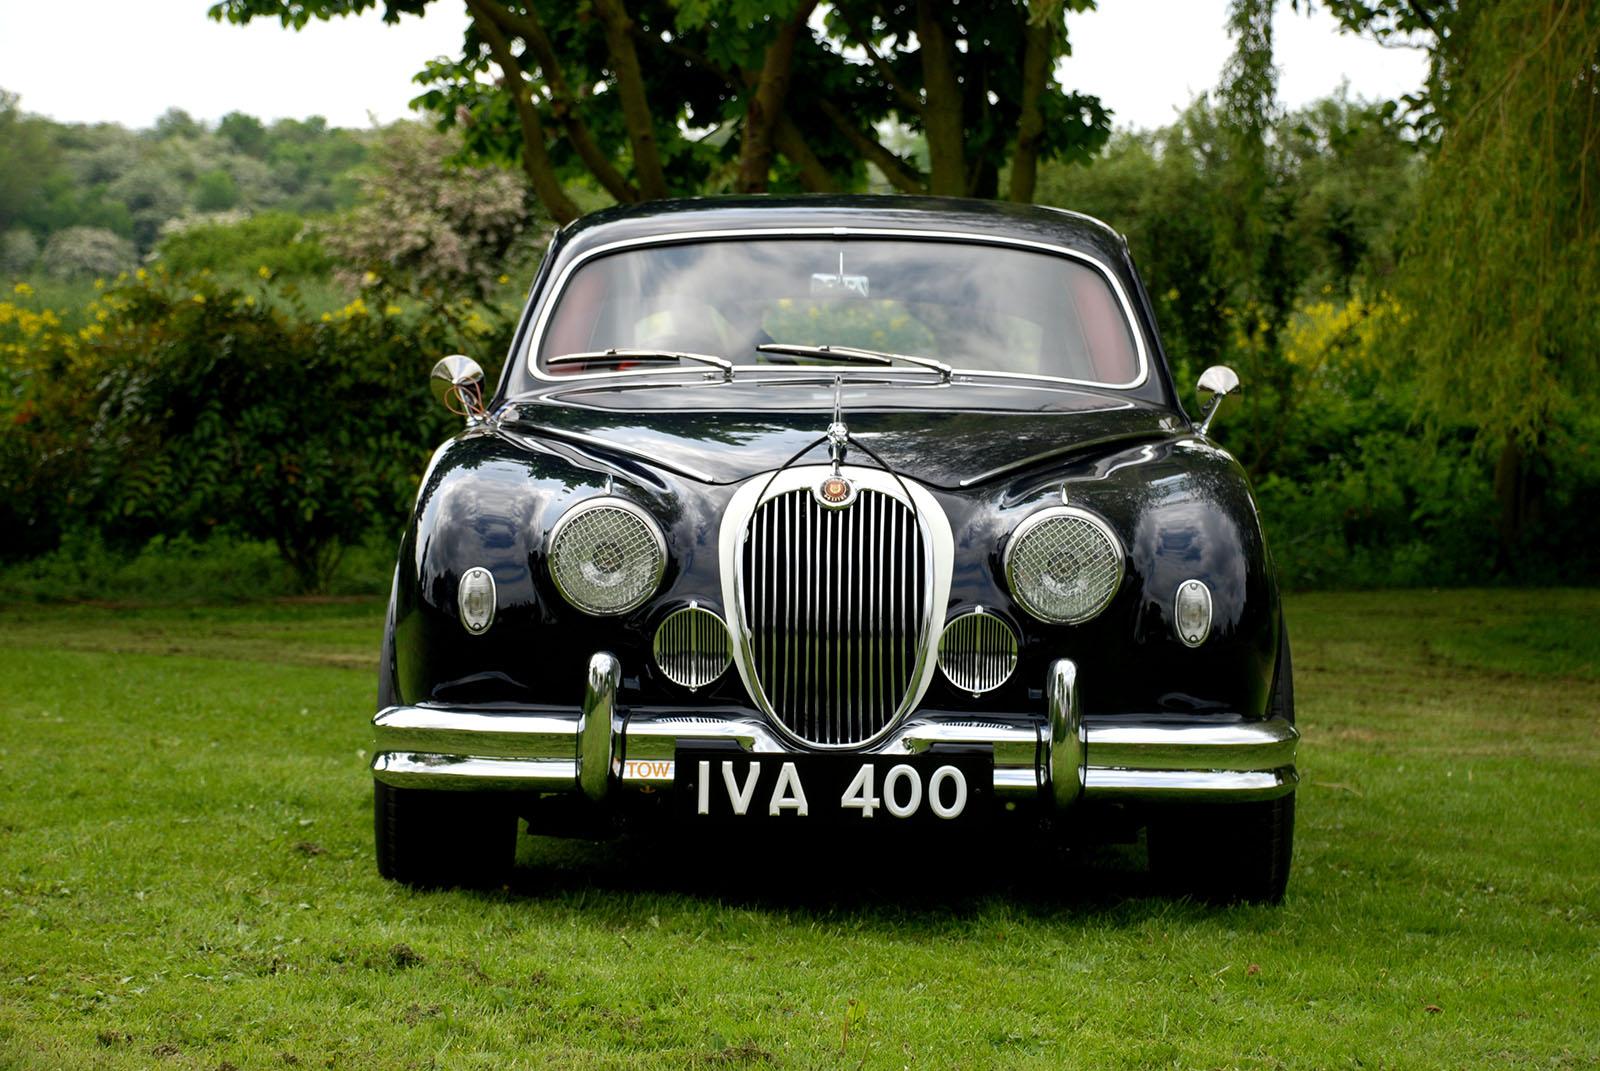 1959 bscc_Jaguar_competition_mk I_sayer selection_scragg_wilkinson_iva400_web_15.jpg